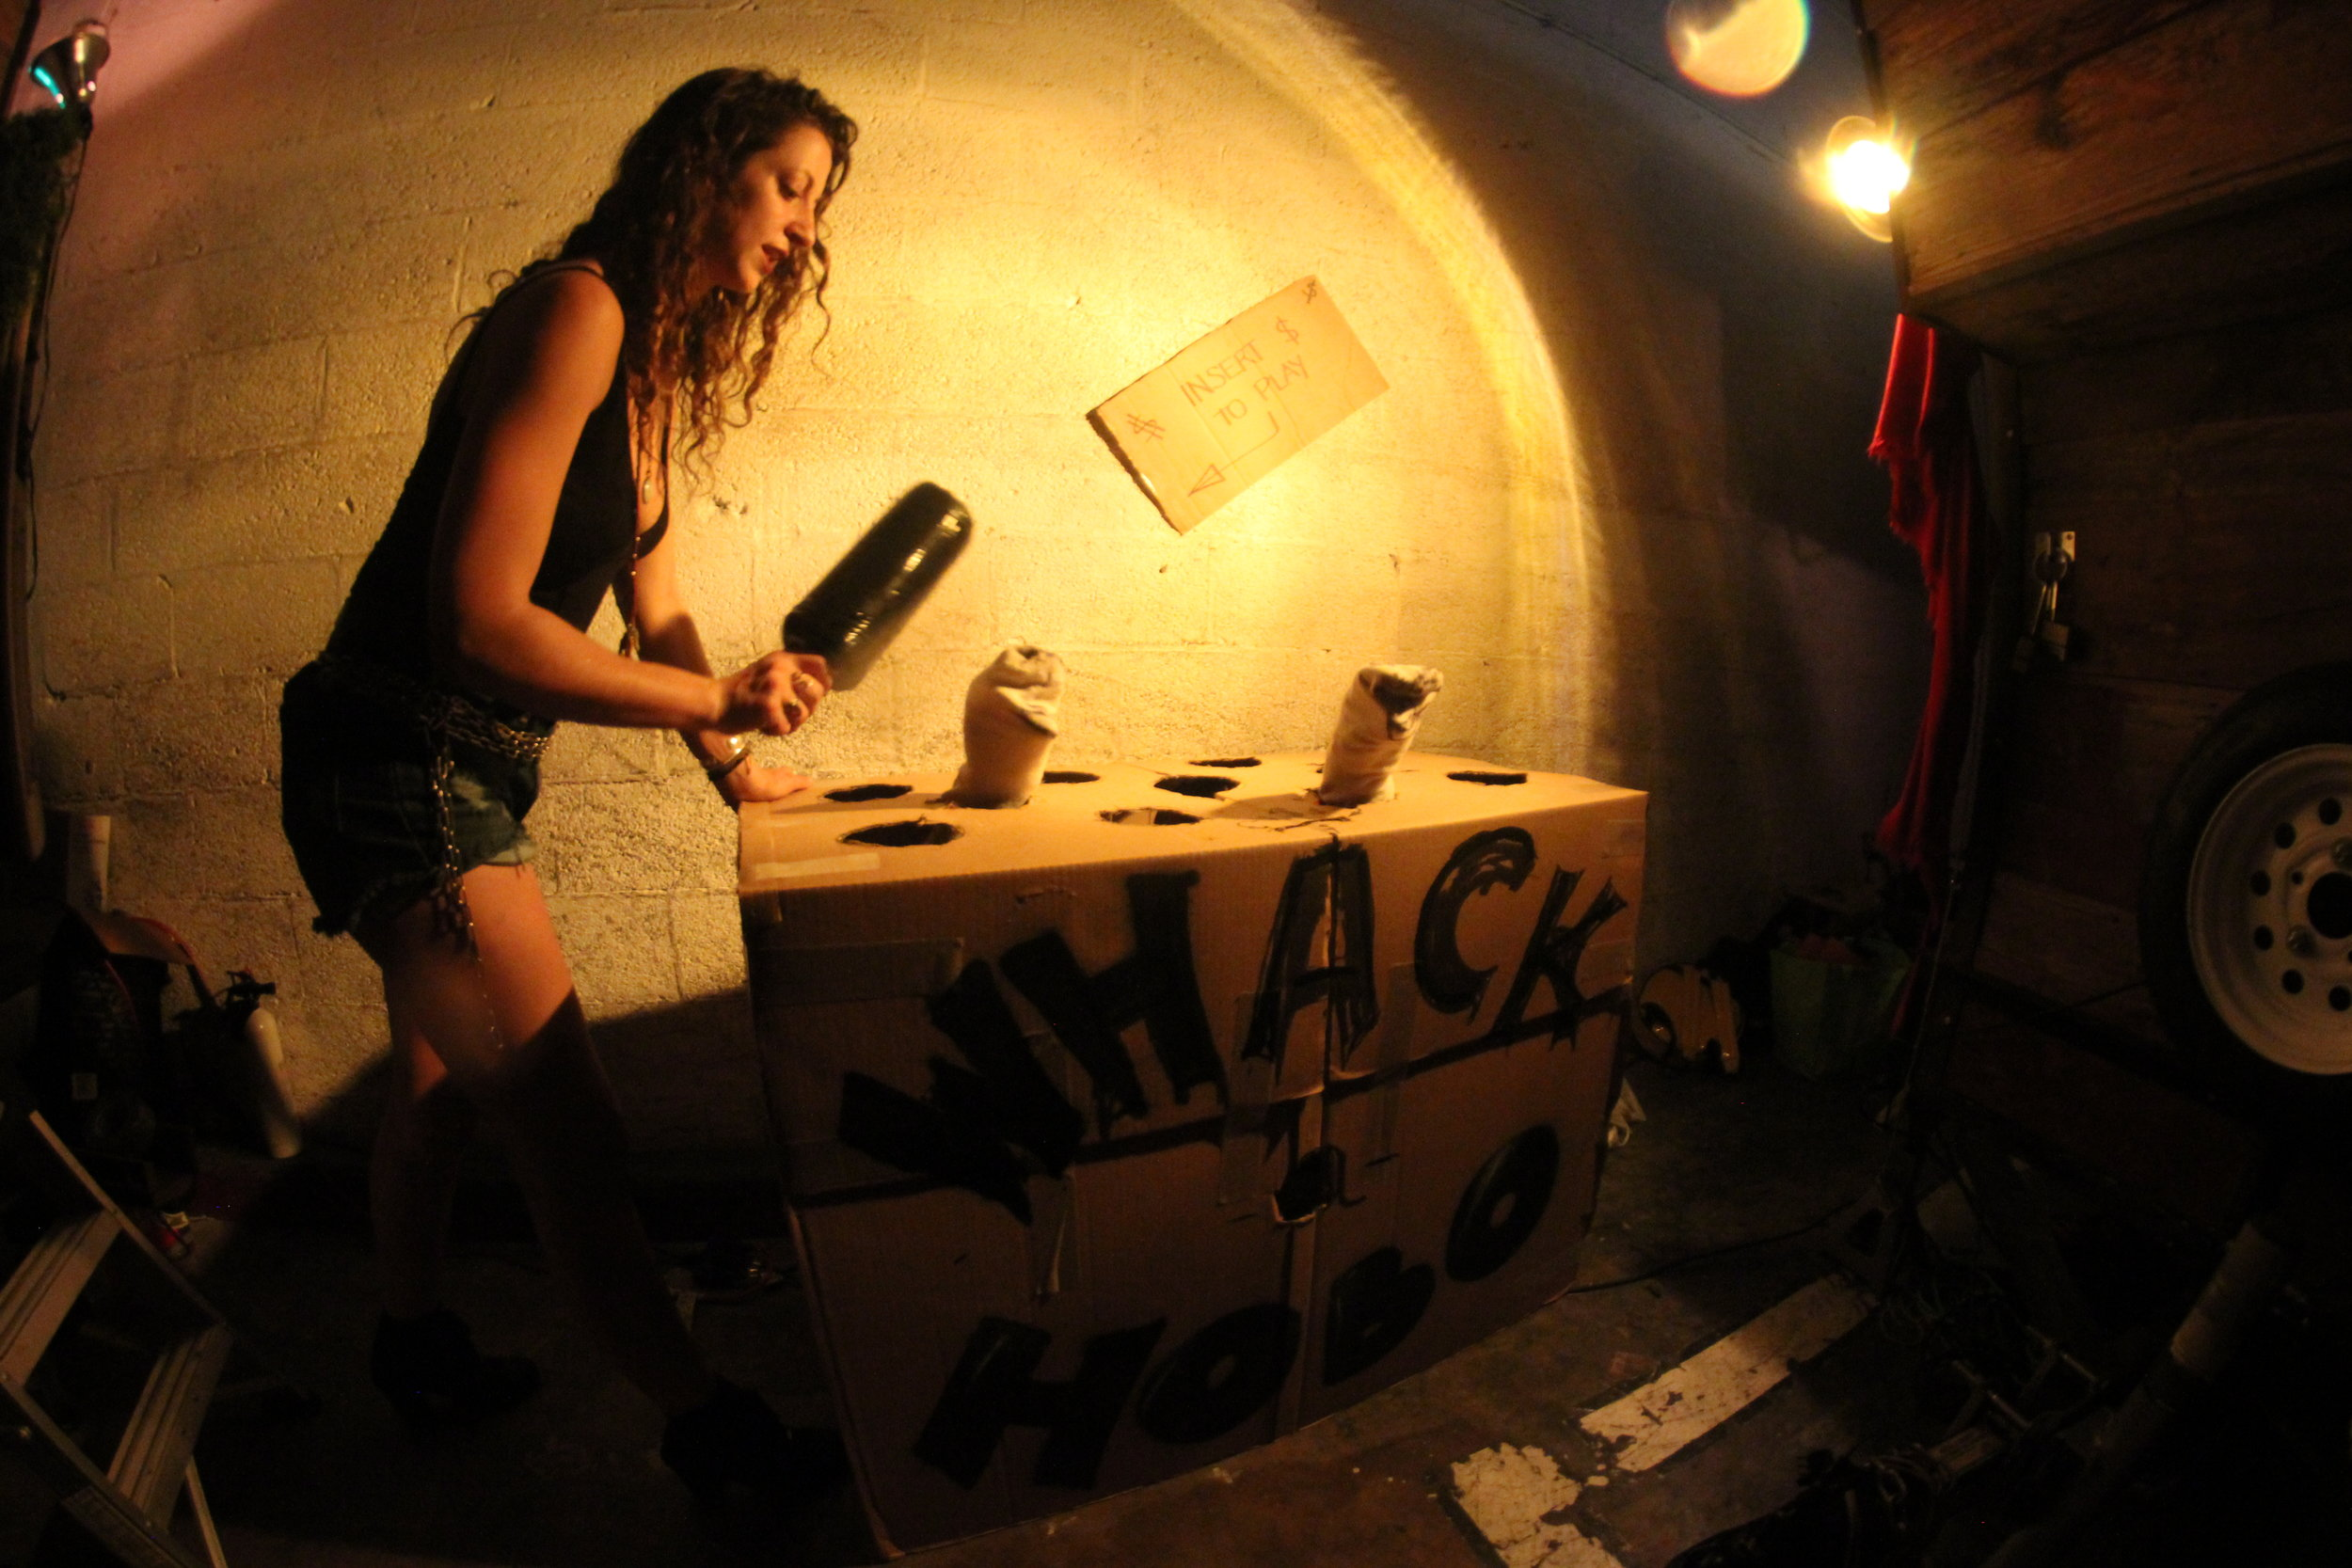 whack a hobo made by shane parez & heather chuck craft